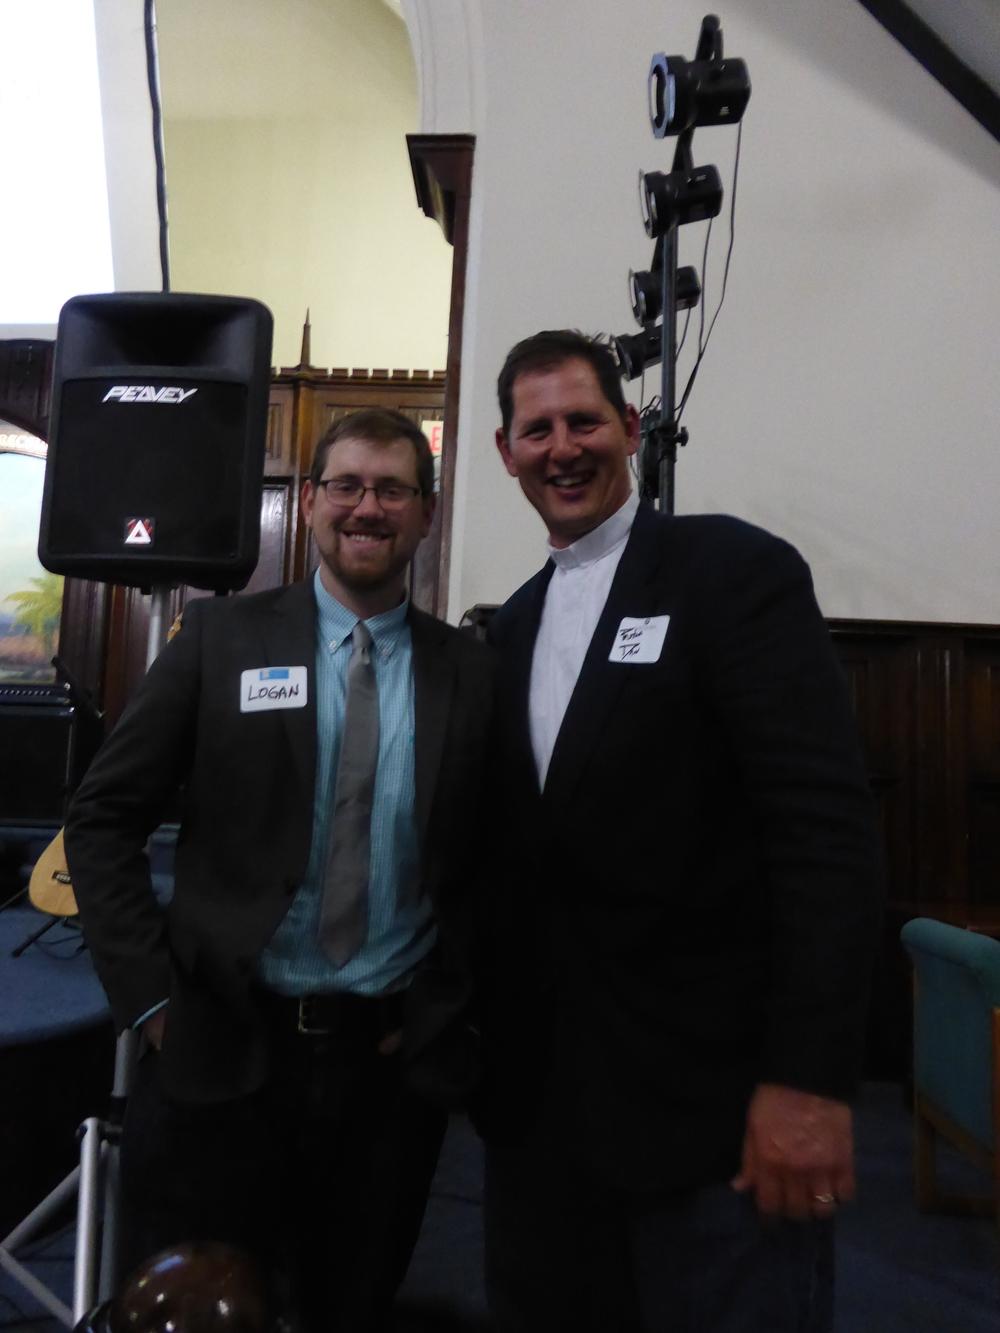 Logan Keck, CTK JP/Roxbury Pastor, and Dan Rogers, CTK Dorchester Pastor